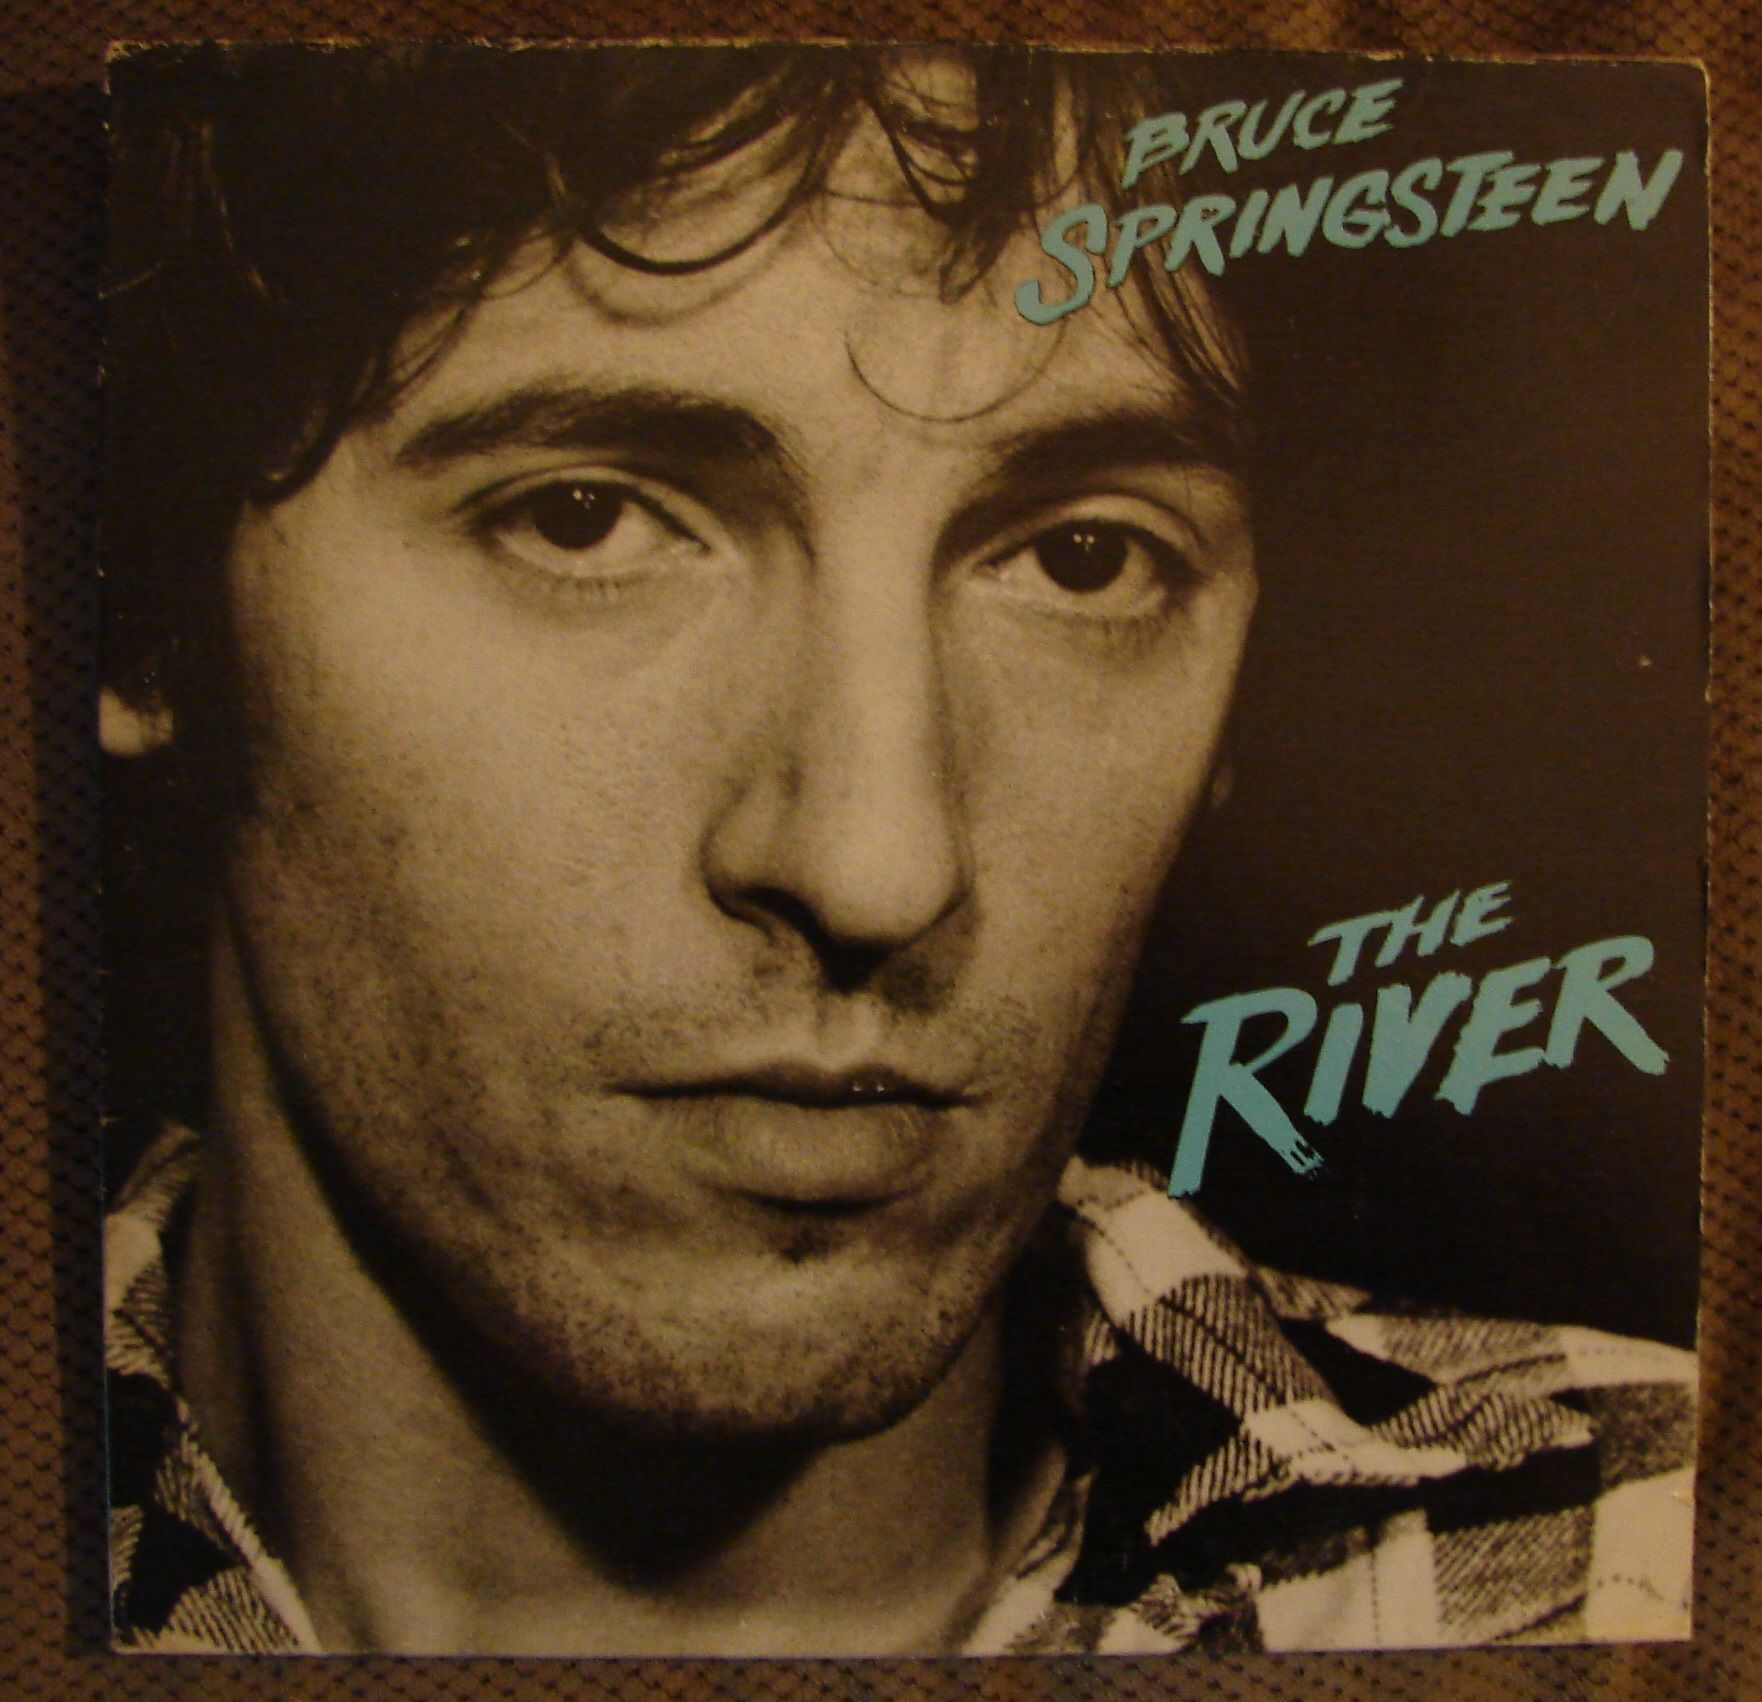 Bruce Springsteen The River Bruce springsteen albums